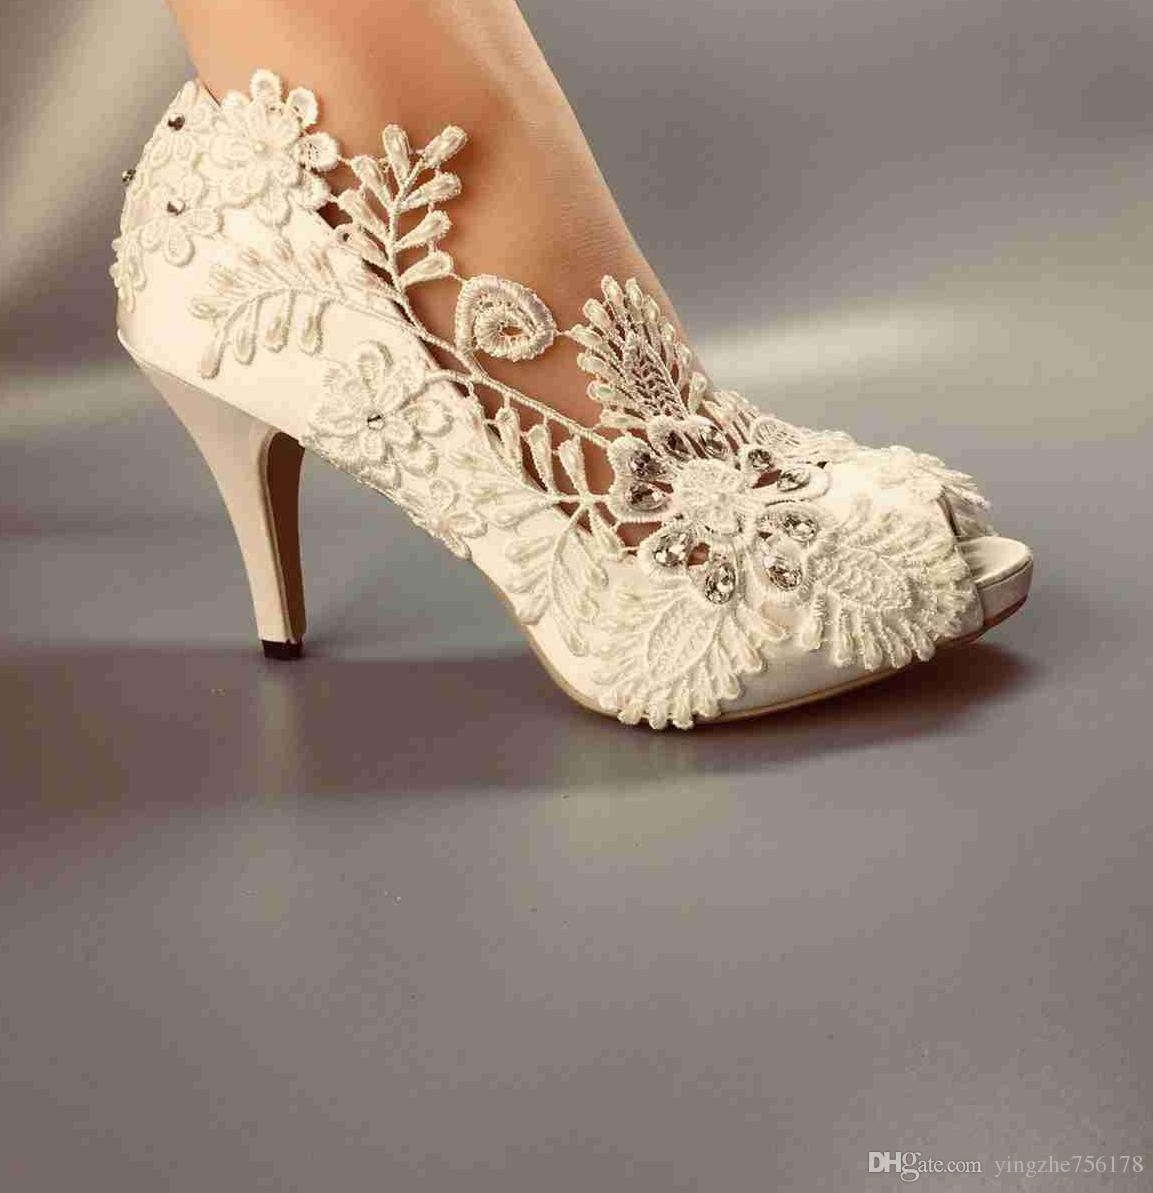 fd6c50a1d Sapato Para Noivas Mulheres Peep Toe Sapatos De Casamento À Prova D 'Água  Branco Lace Noiva Vestidos De Noiva HEEL Diamante Lace Manual De Casamento  Sapatos ...